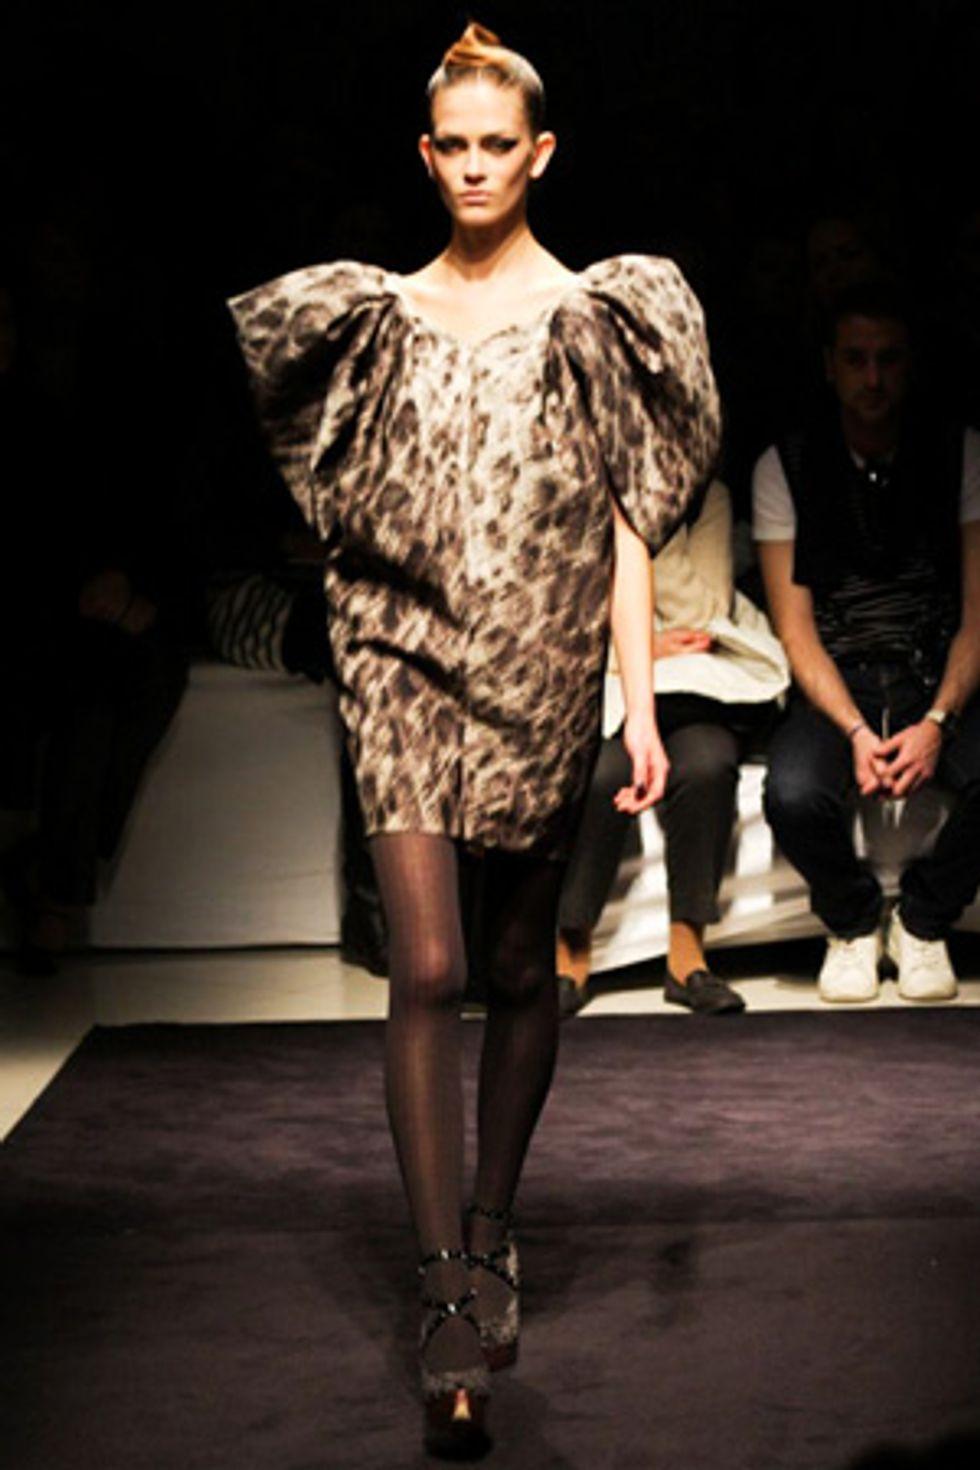 Milan Fashion Week Report: Albino